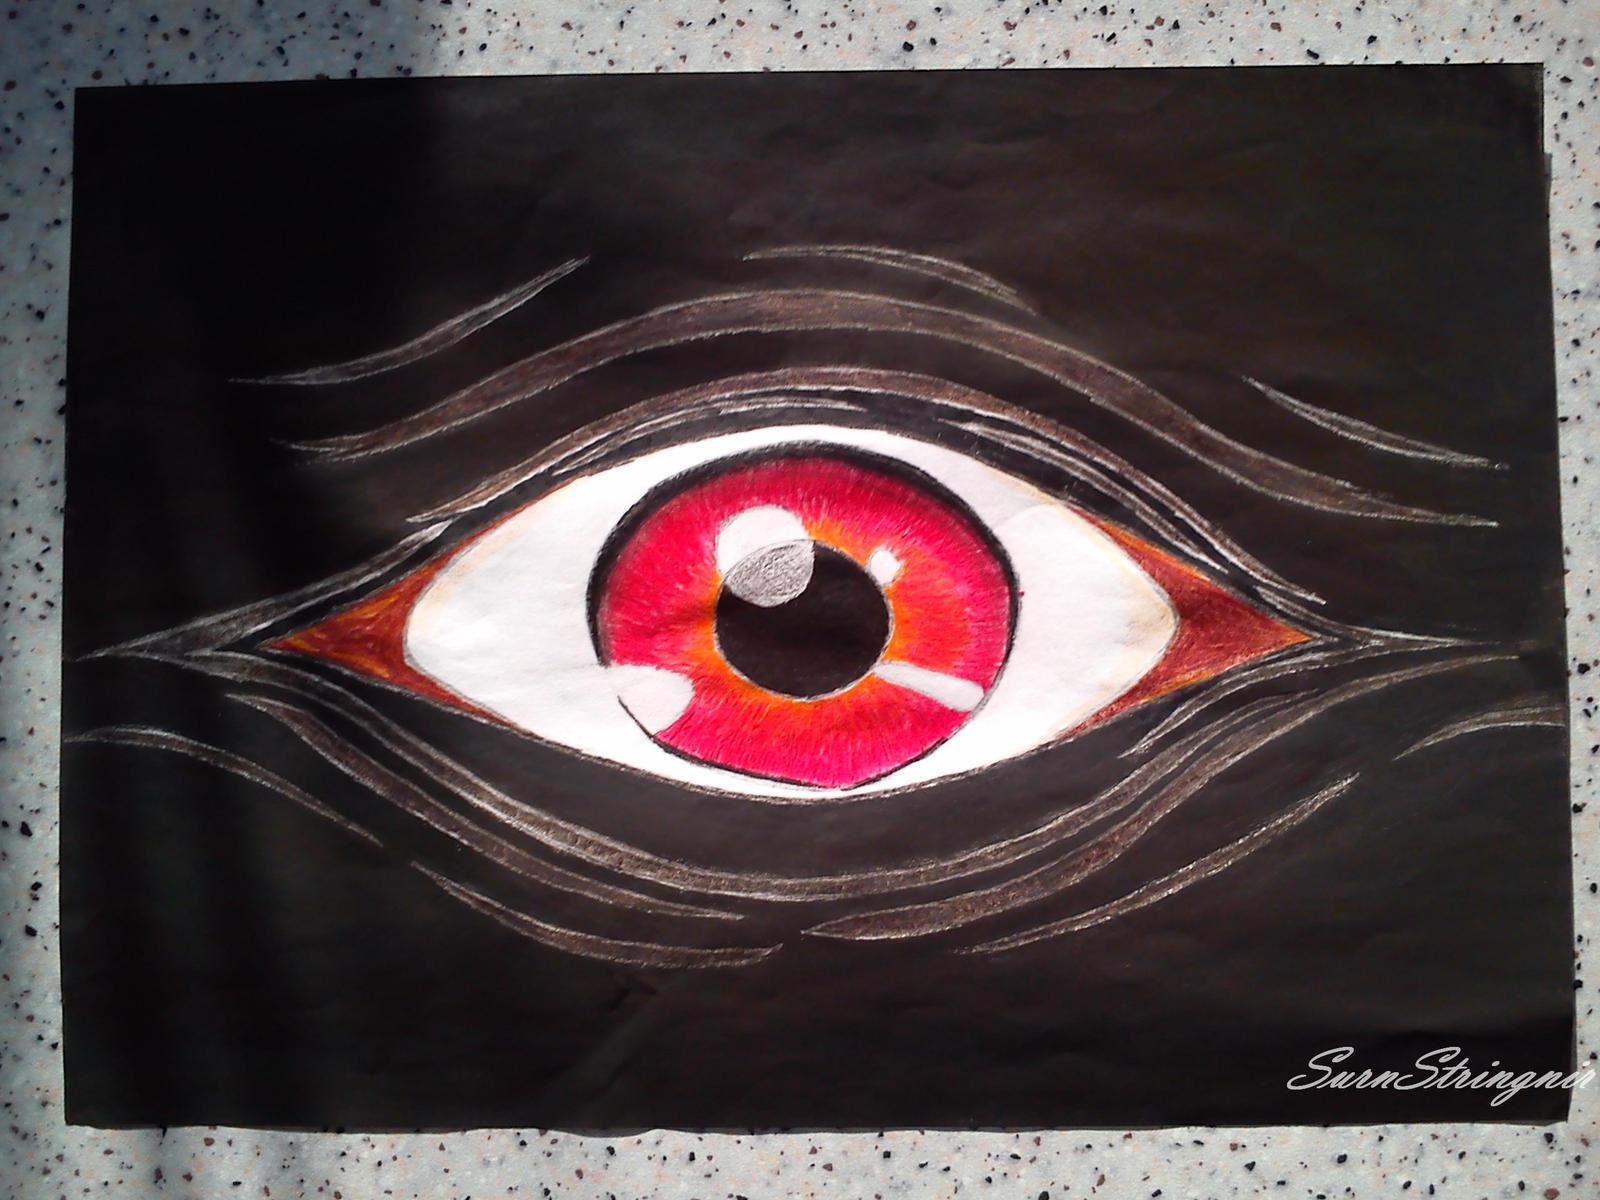 Alucard eye by SurnStringnir on DeviantArt  Alucard